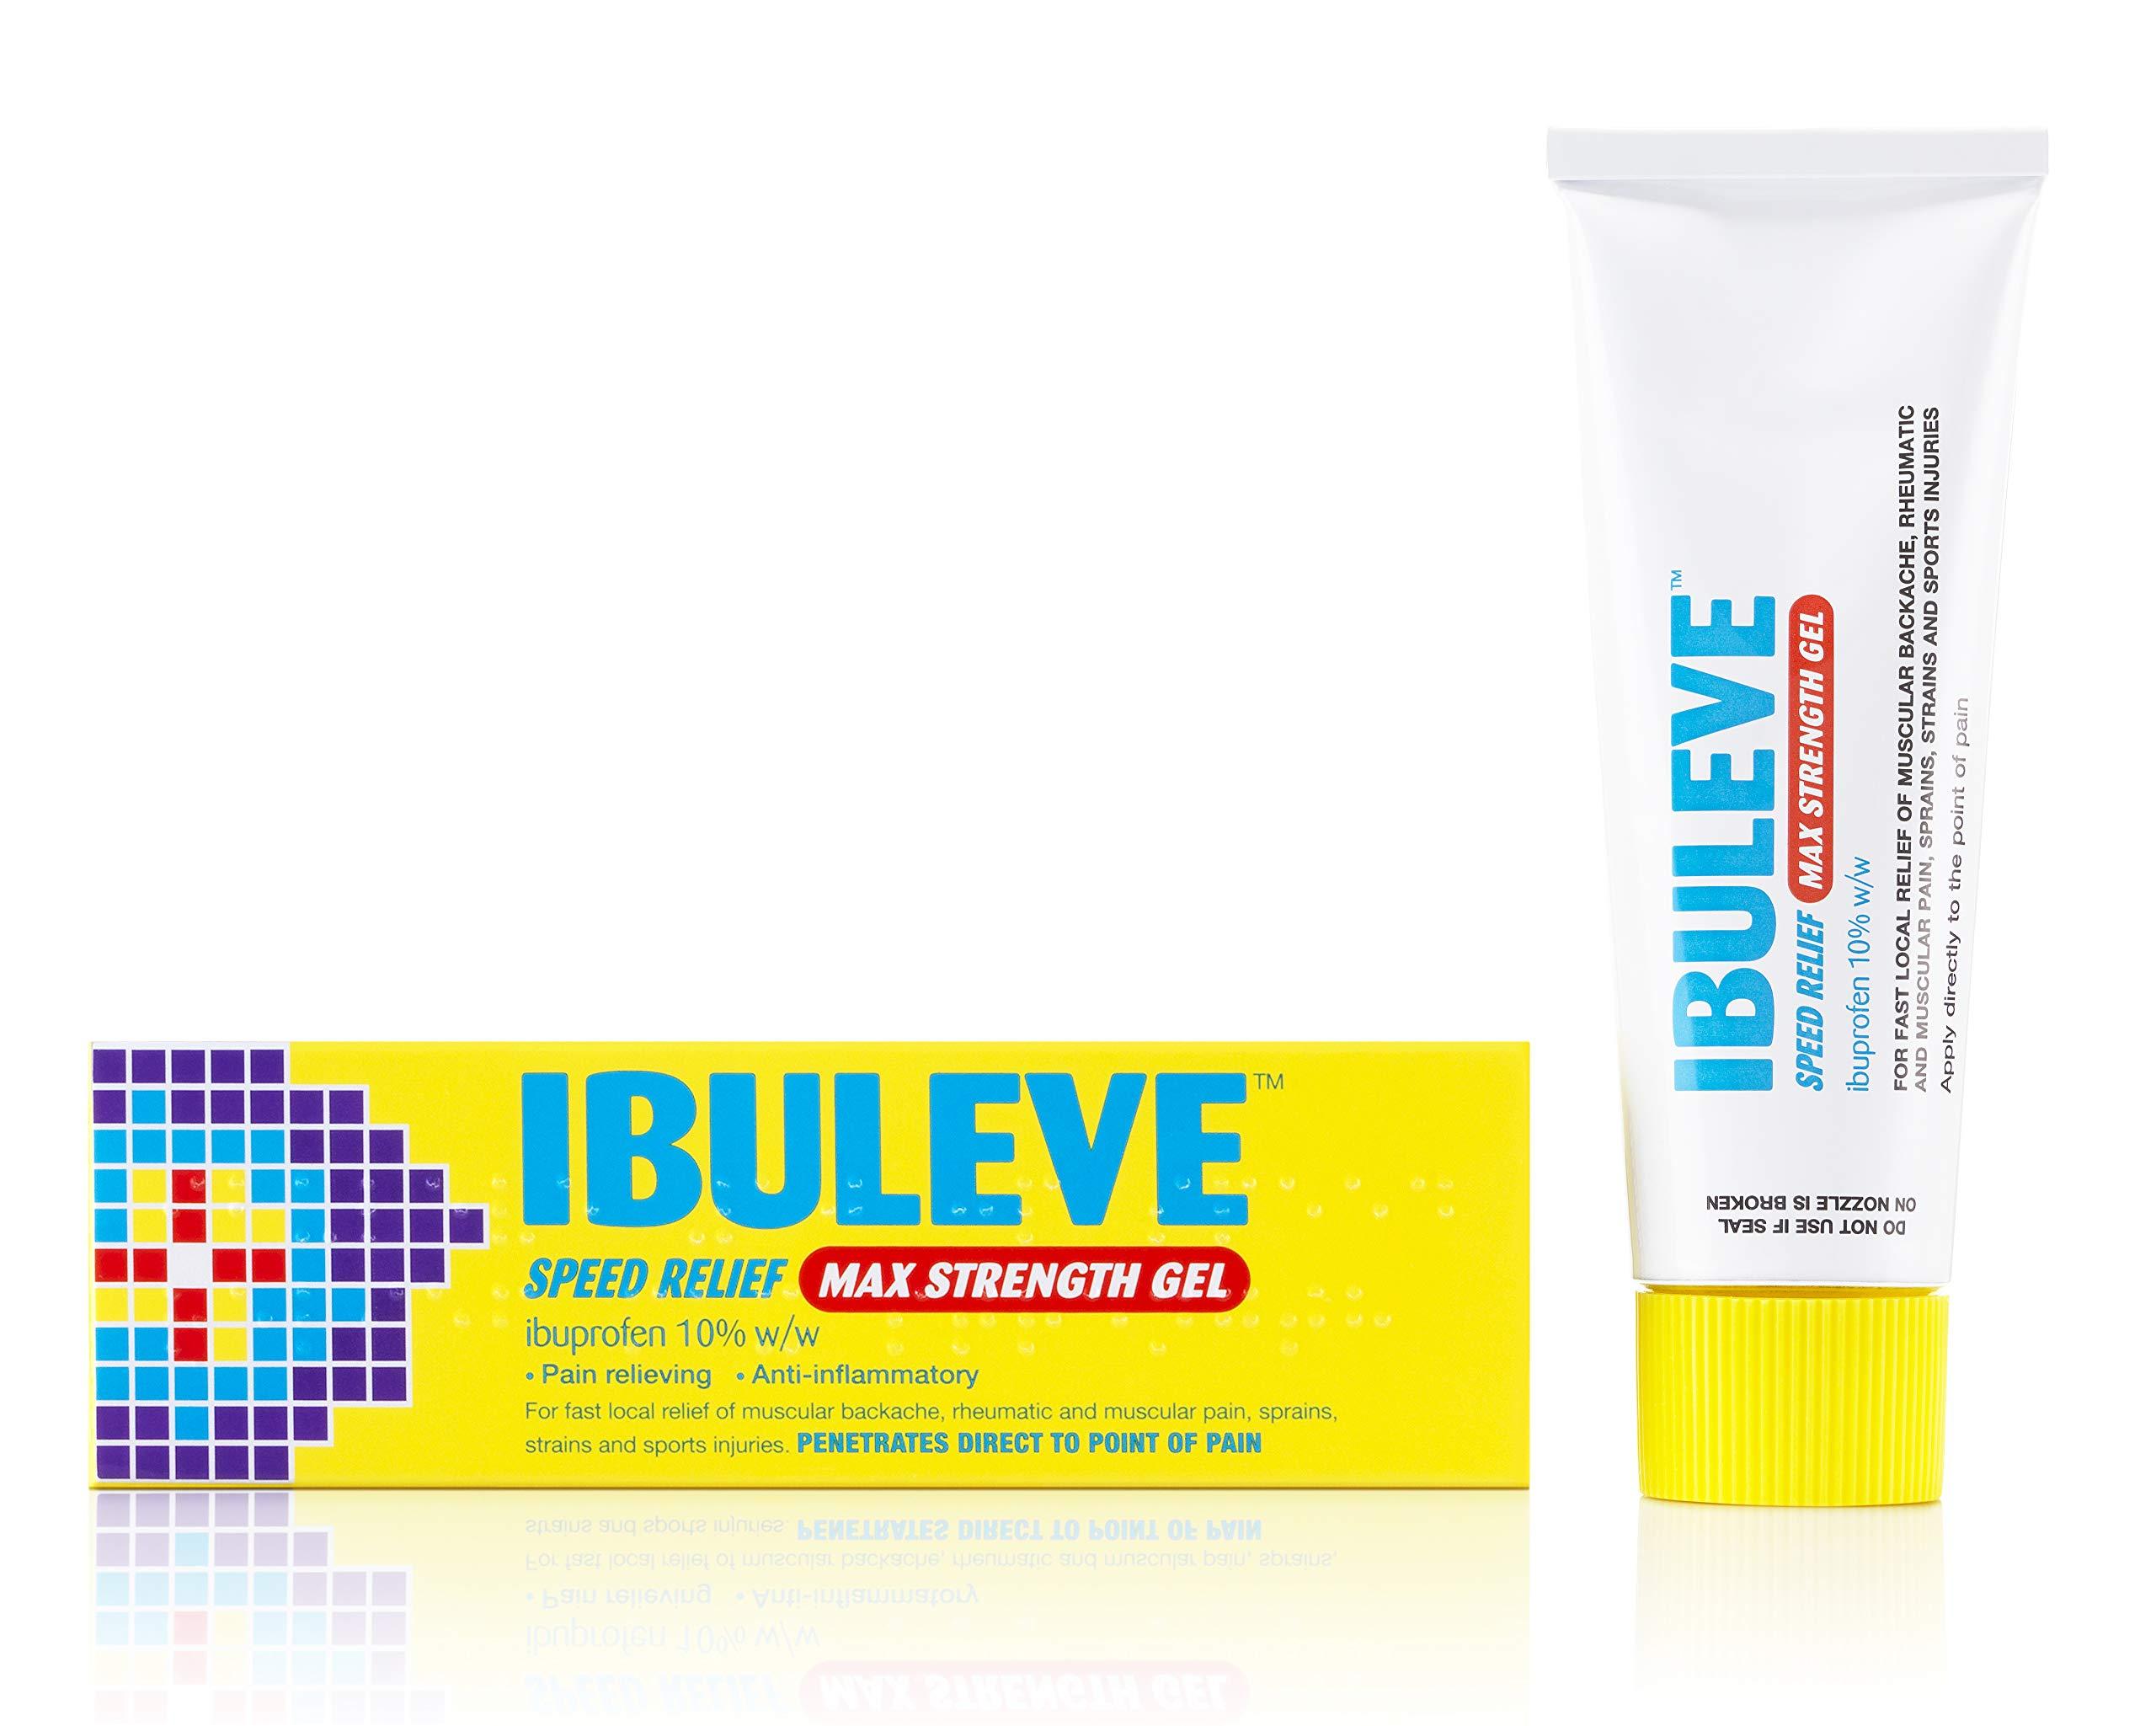 Ibuleve Speed Relief Max Strength Gel with 10% Ibuprofen, 40g